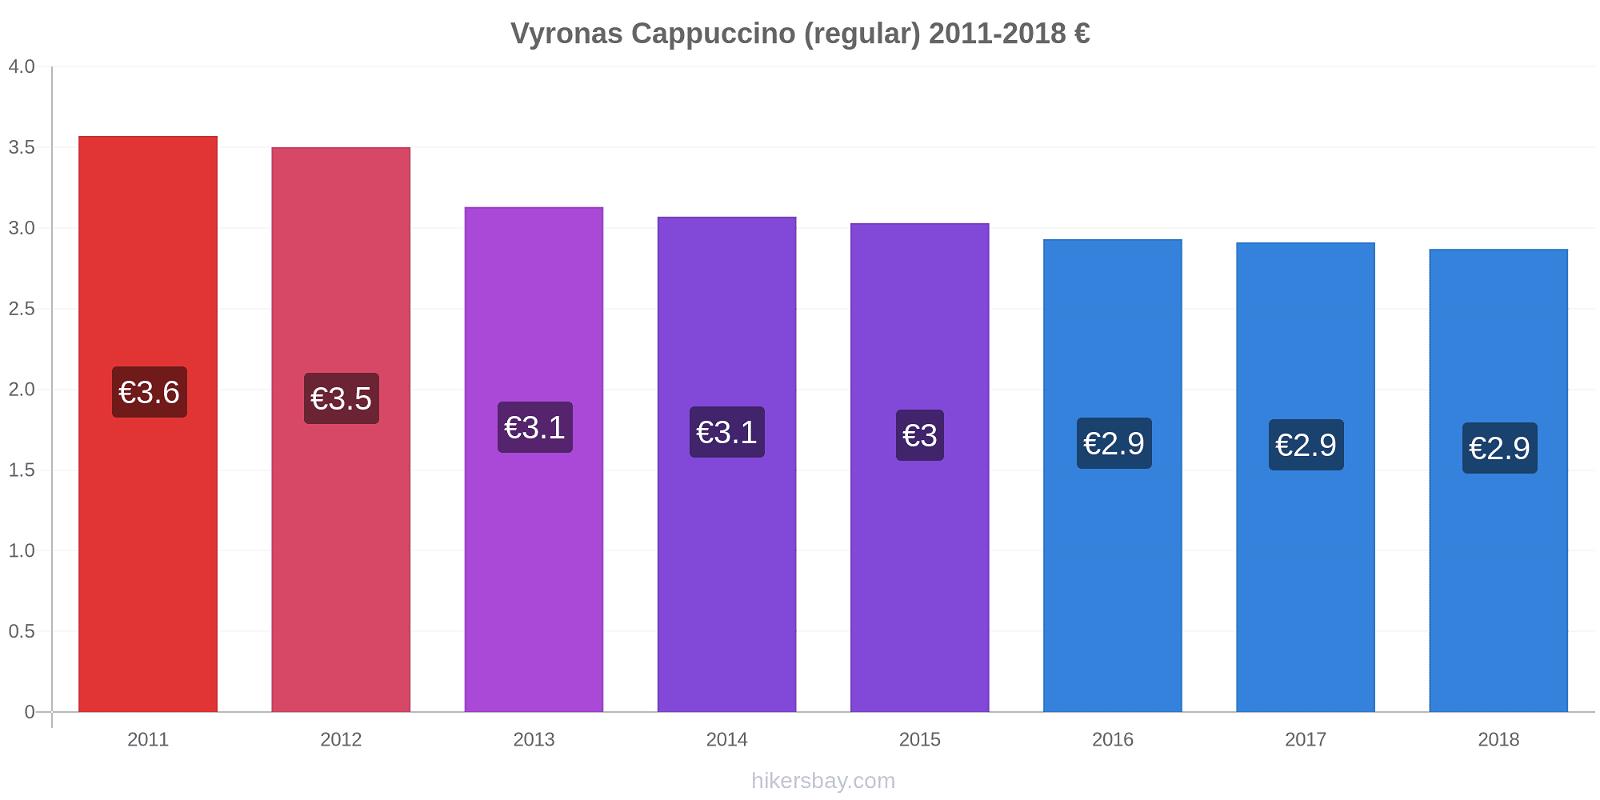 Vyronas price changes Cappuccino (regular) hikersbay.com